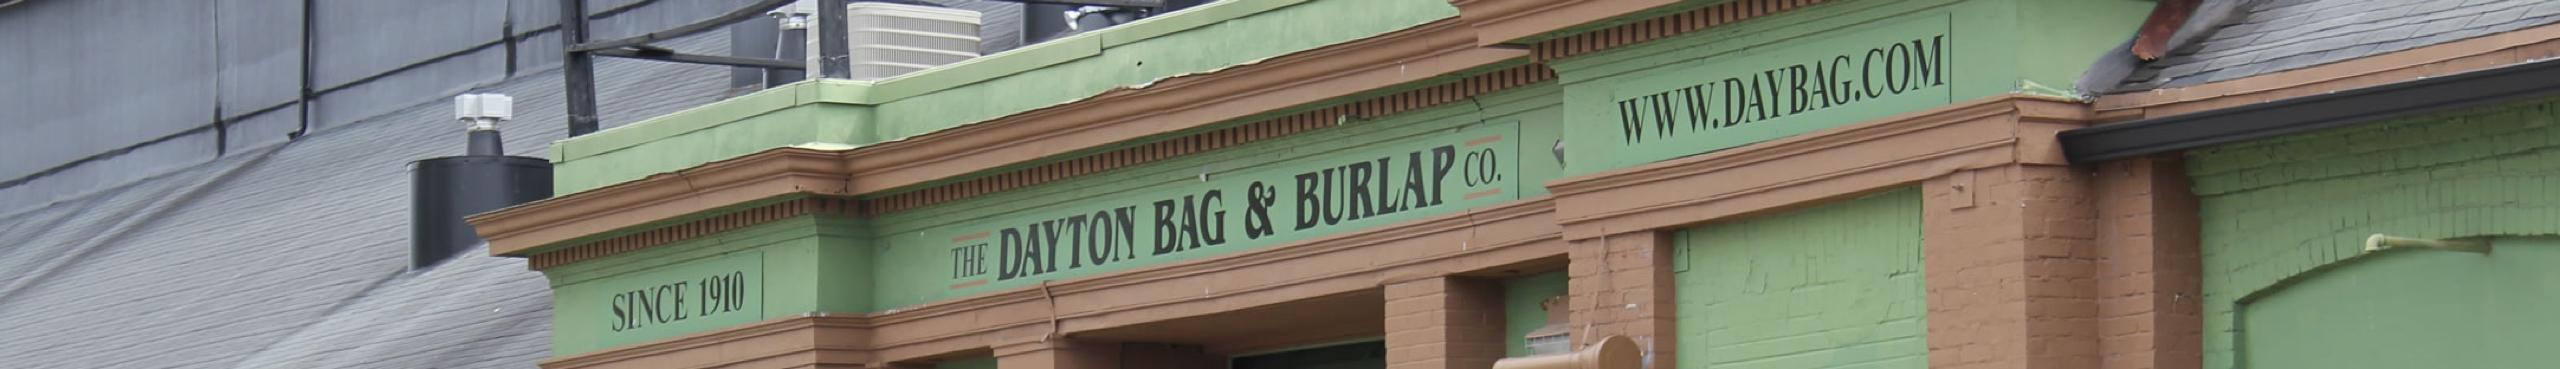 Dayton Bag & Burlap Locations Cover